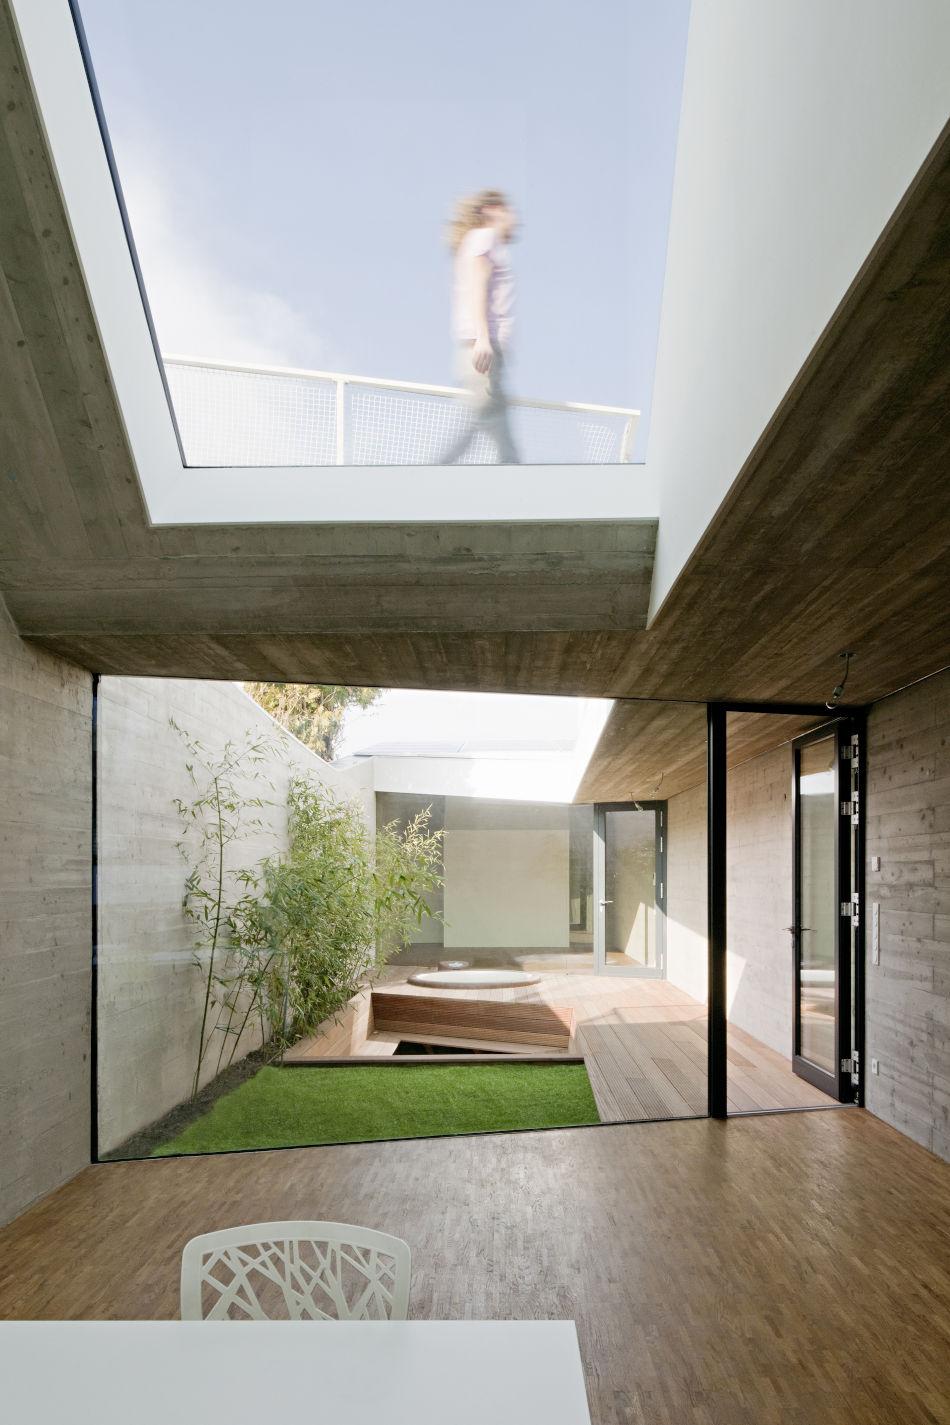 Caramel Architekten